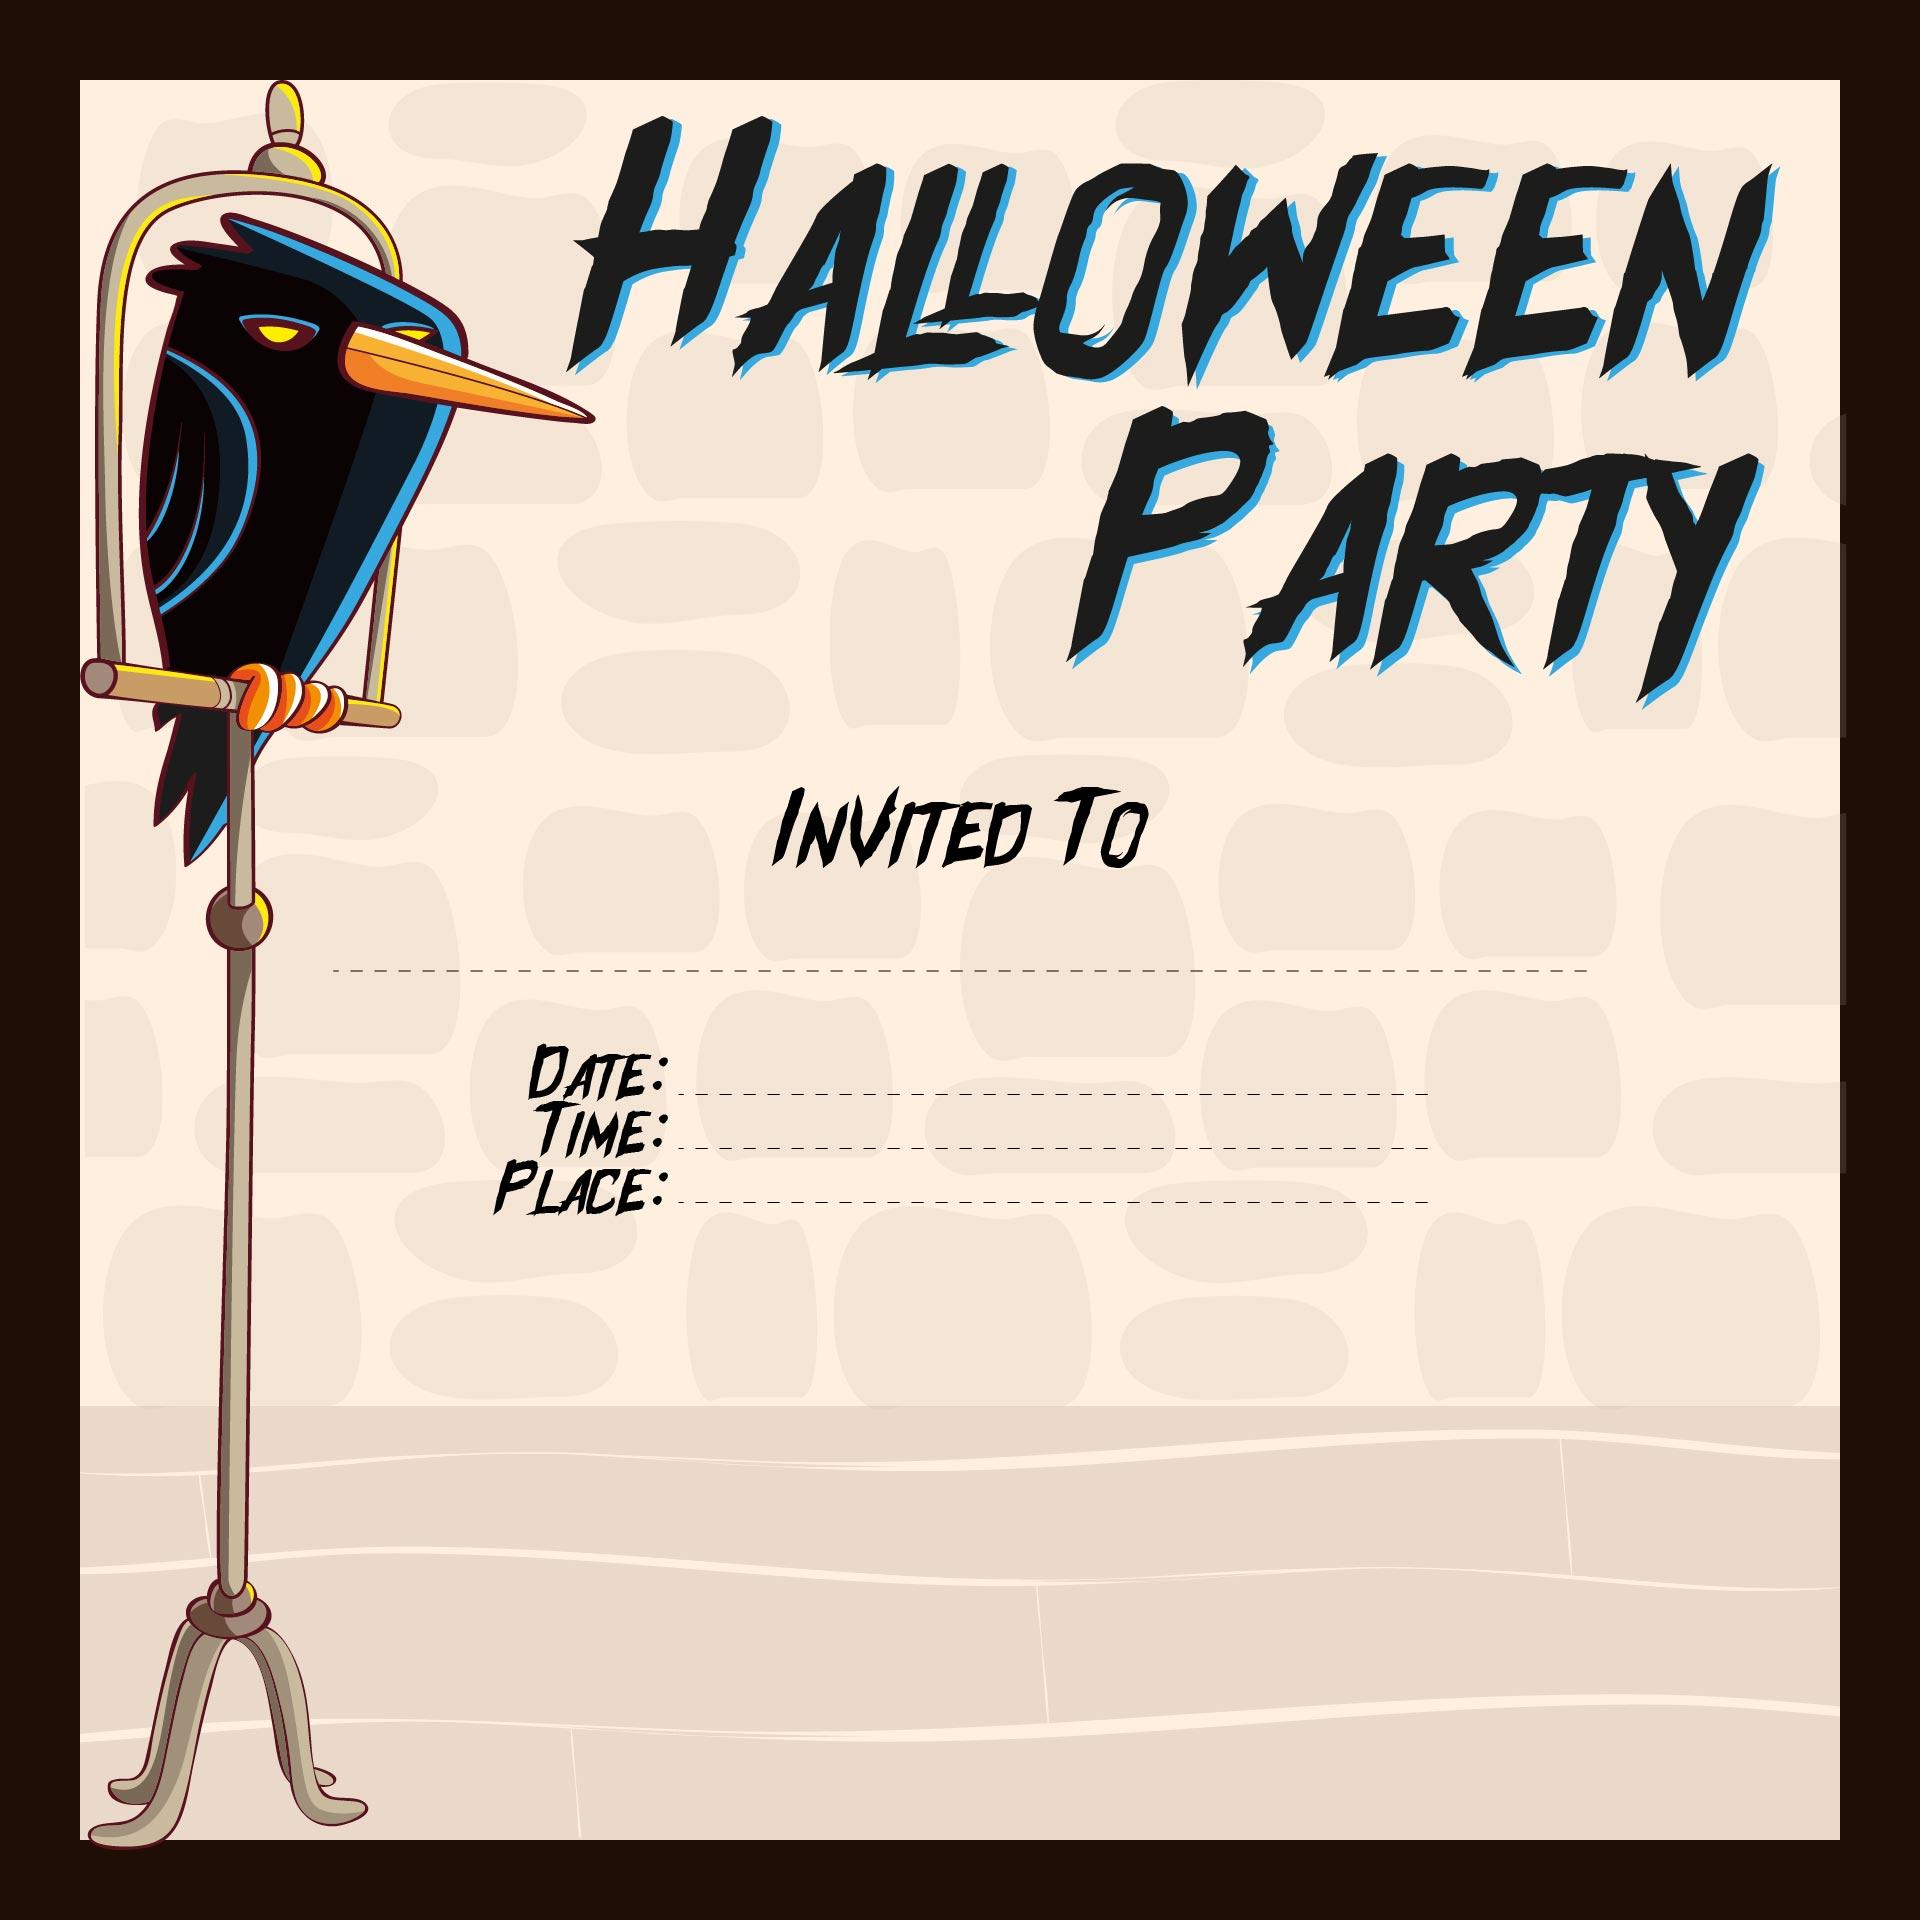 Halloween Party Invitation Printable Free